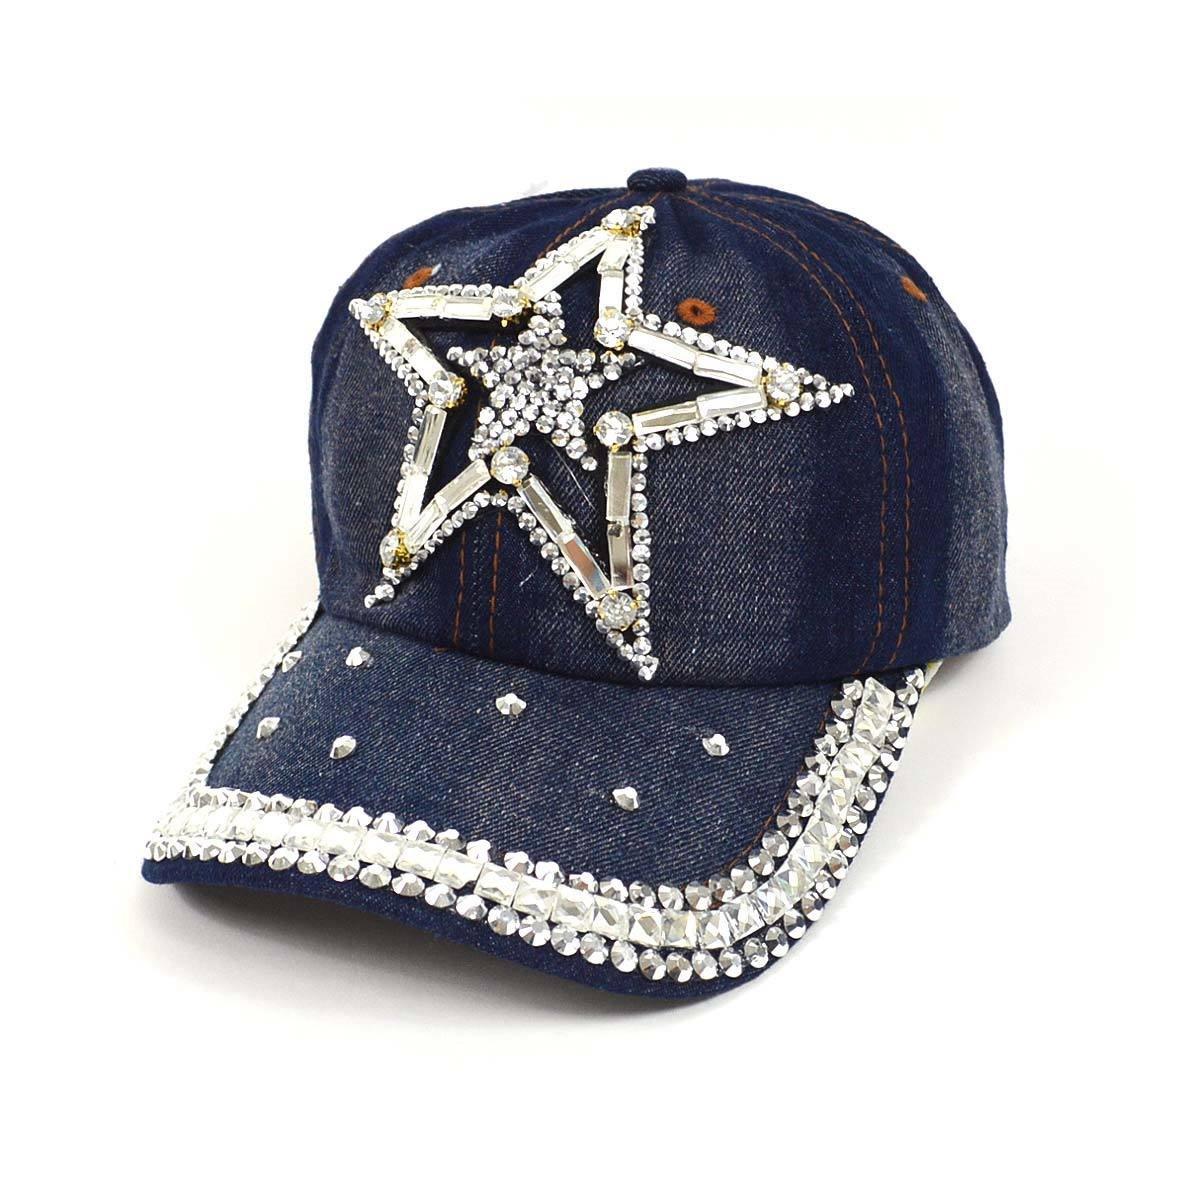 2366d3888a8e69 Nollia Bling Star Embellished Adjustable Baseball Cap Hat~Dark Denim at  Amazon Women's Clothing store: